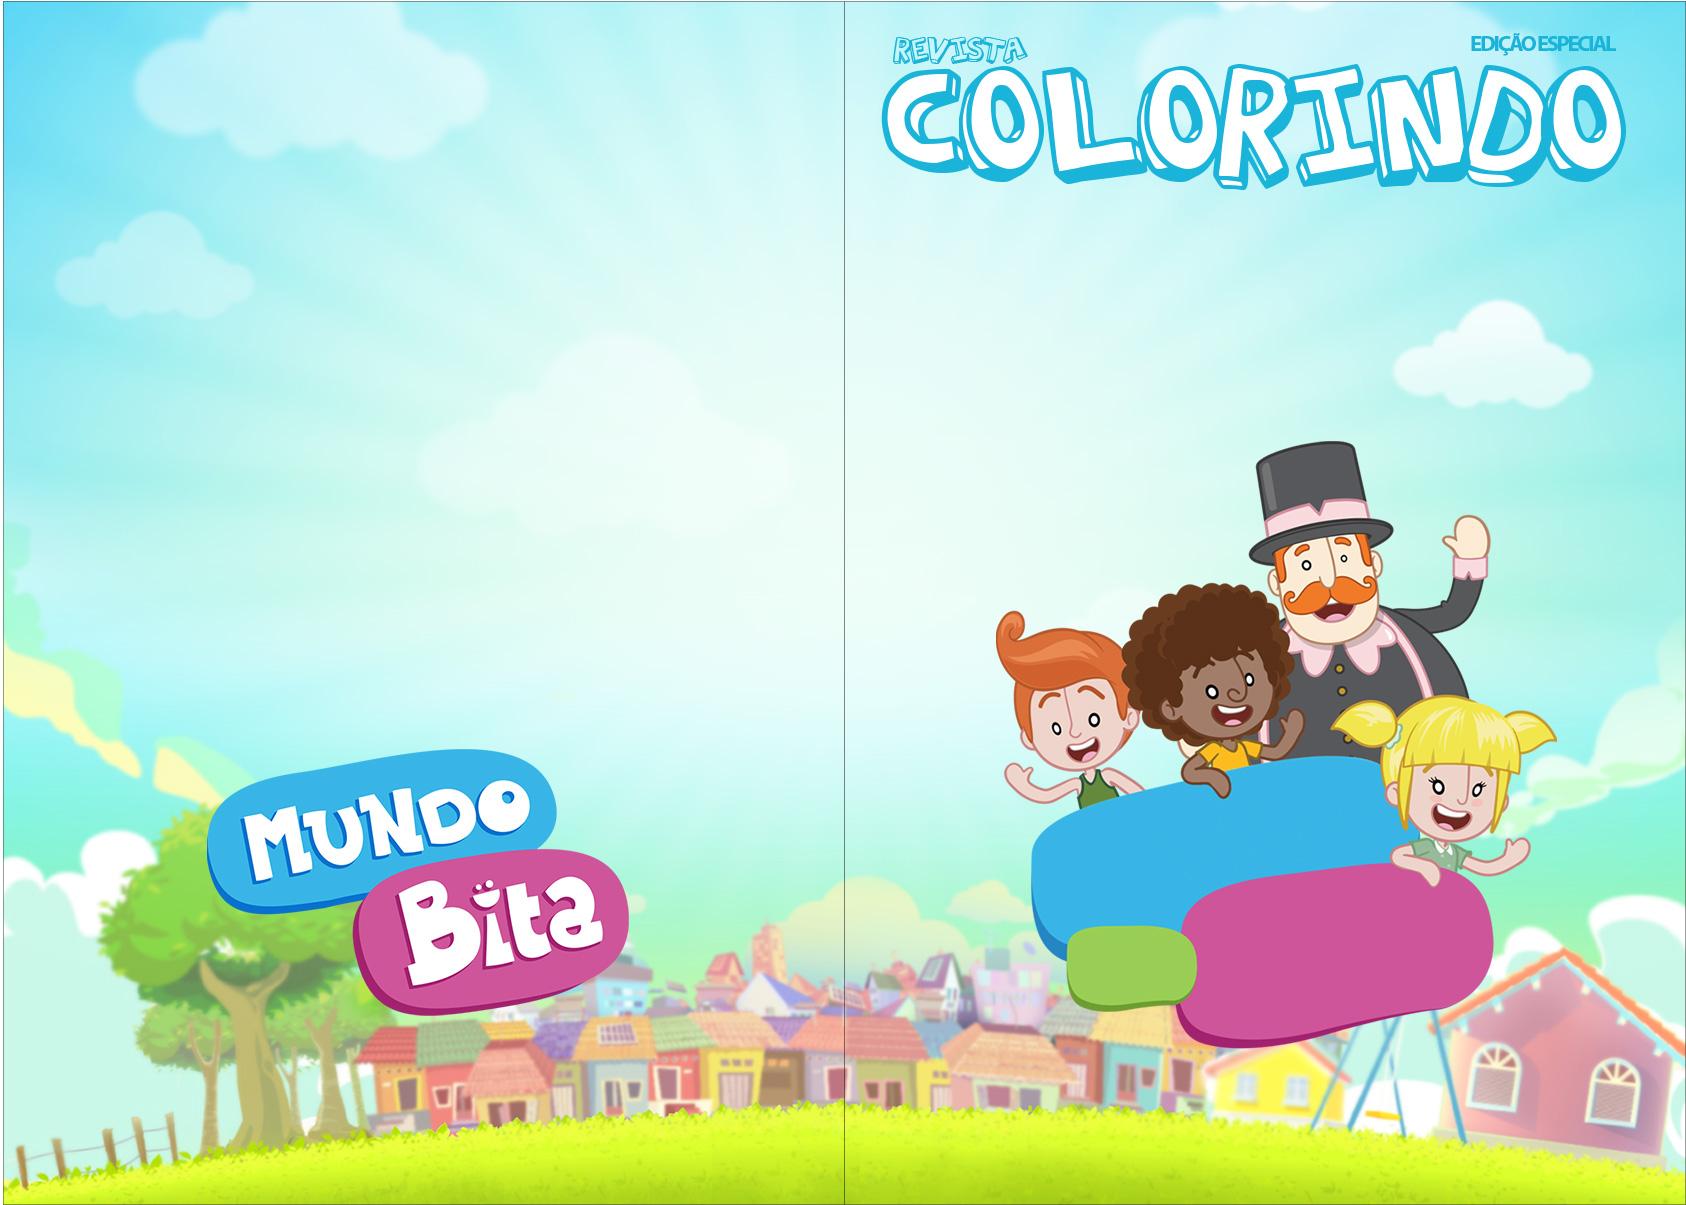 Revista Colorindo Mundo Bita